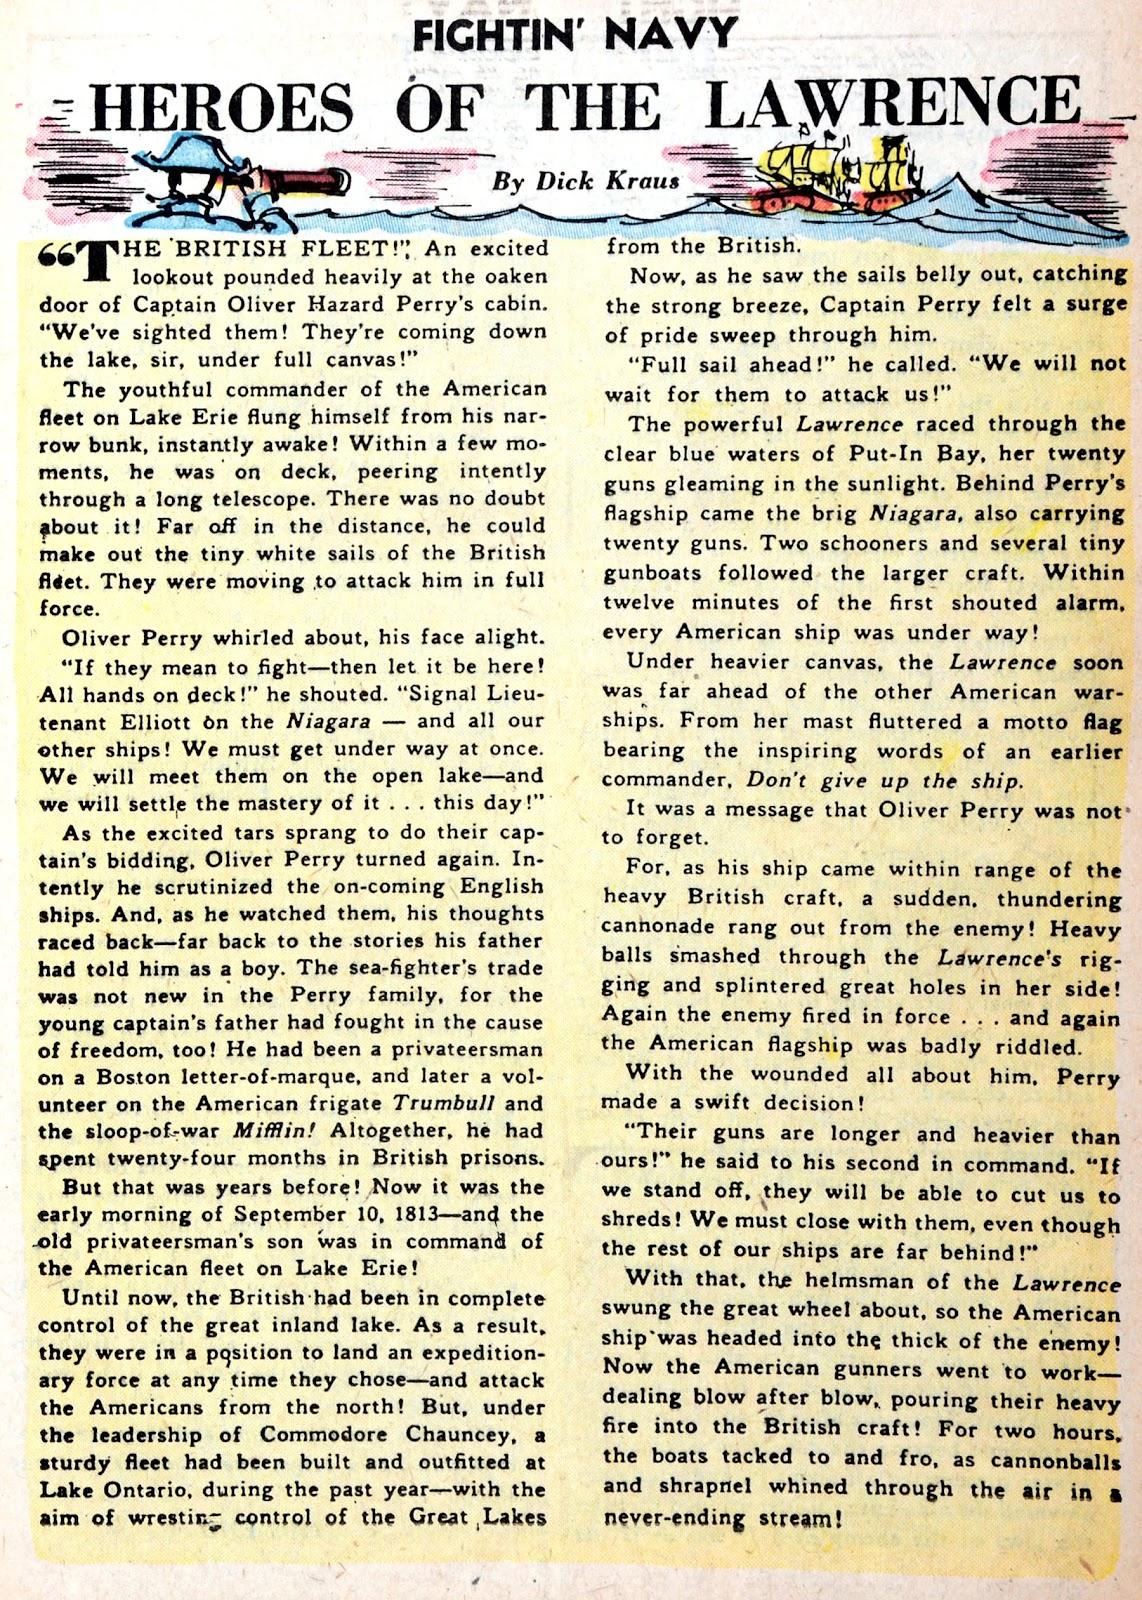 Read online Fightin' Navy comic -  Issue #75 - 17